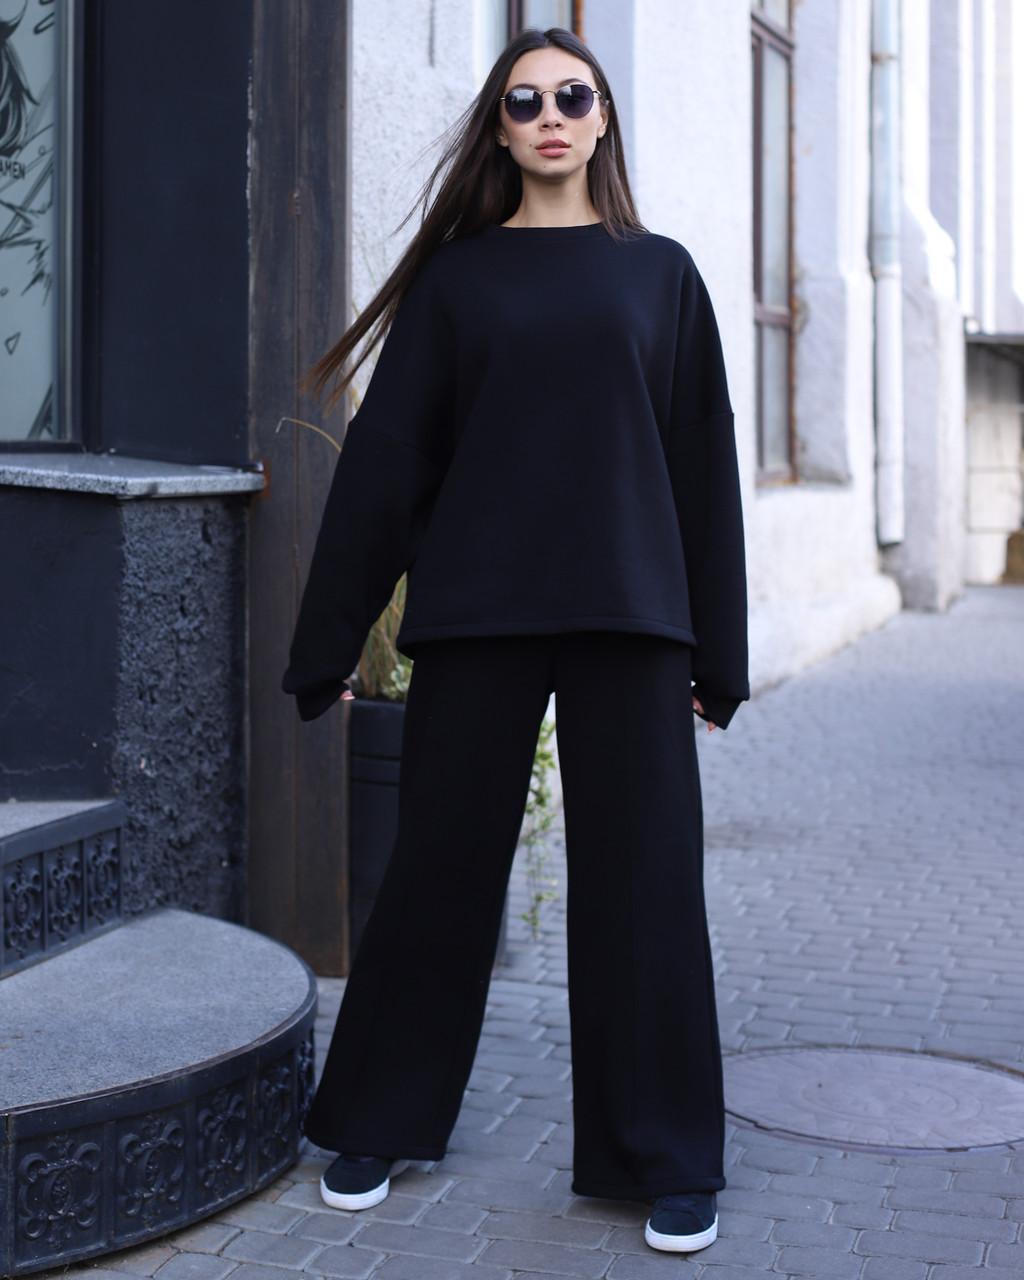 Свитшо женский чёрный Джин от бренда ТУР размер S-M